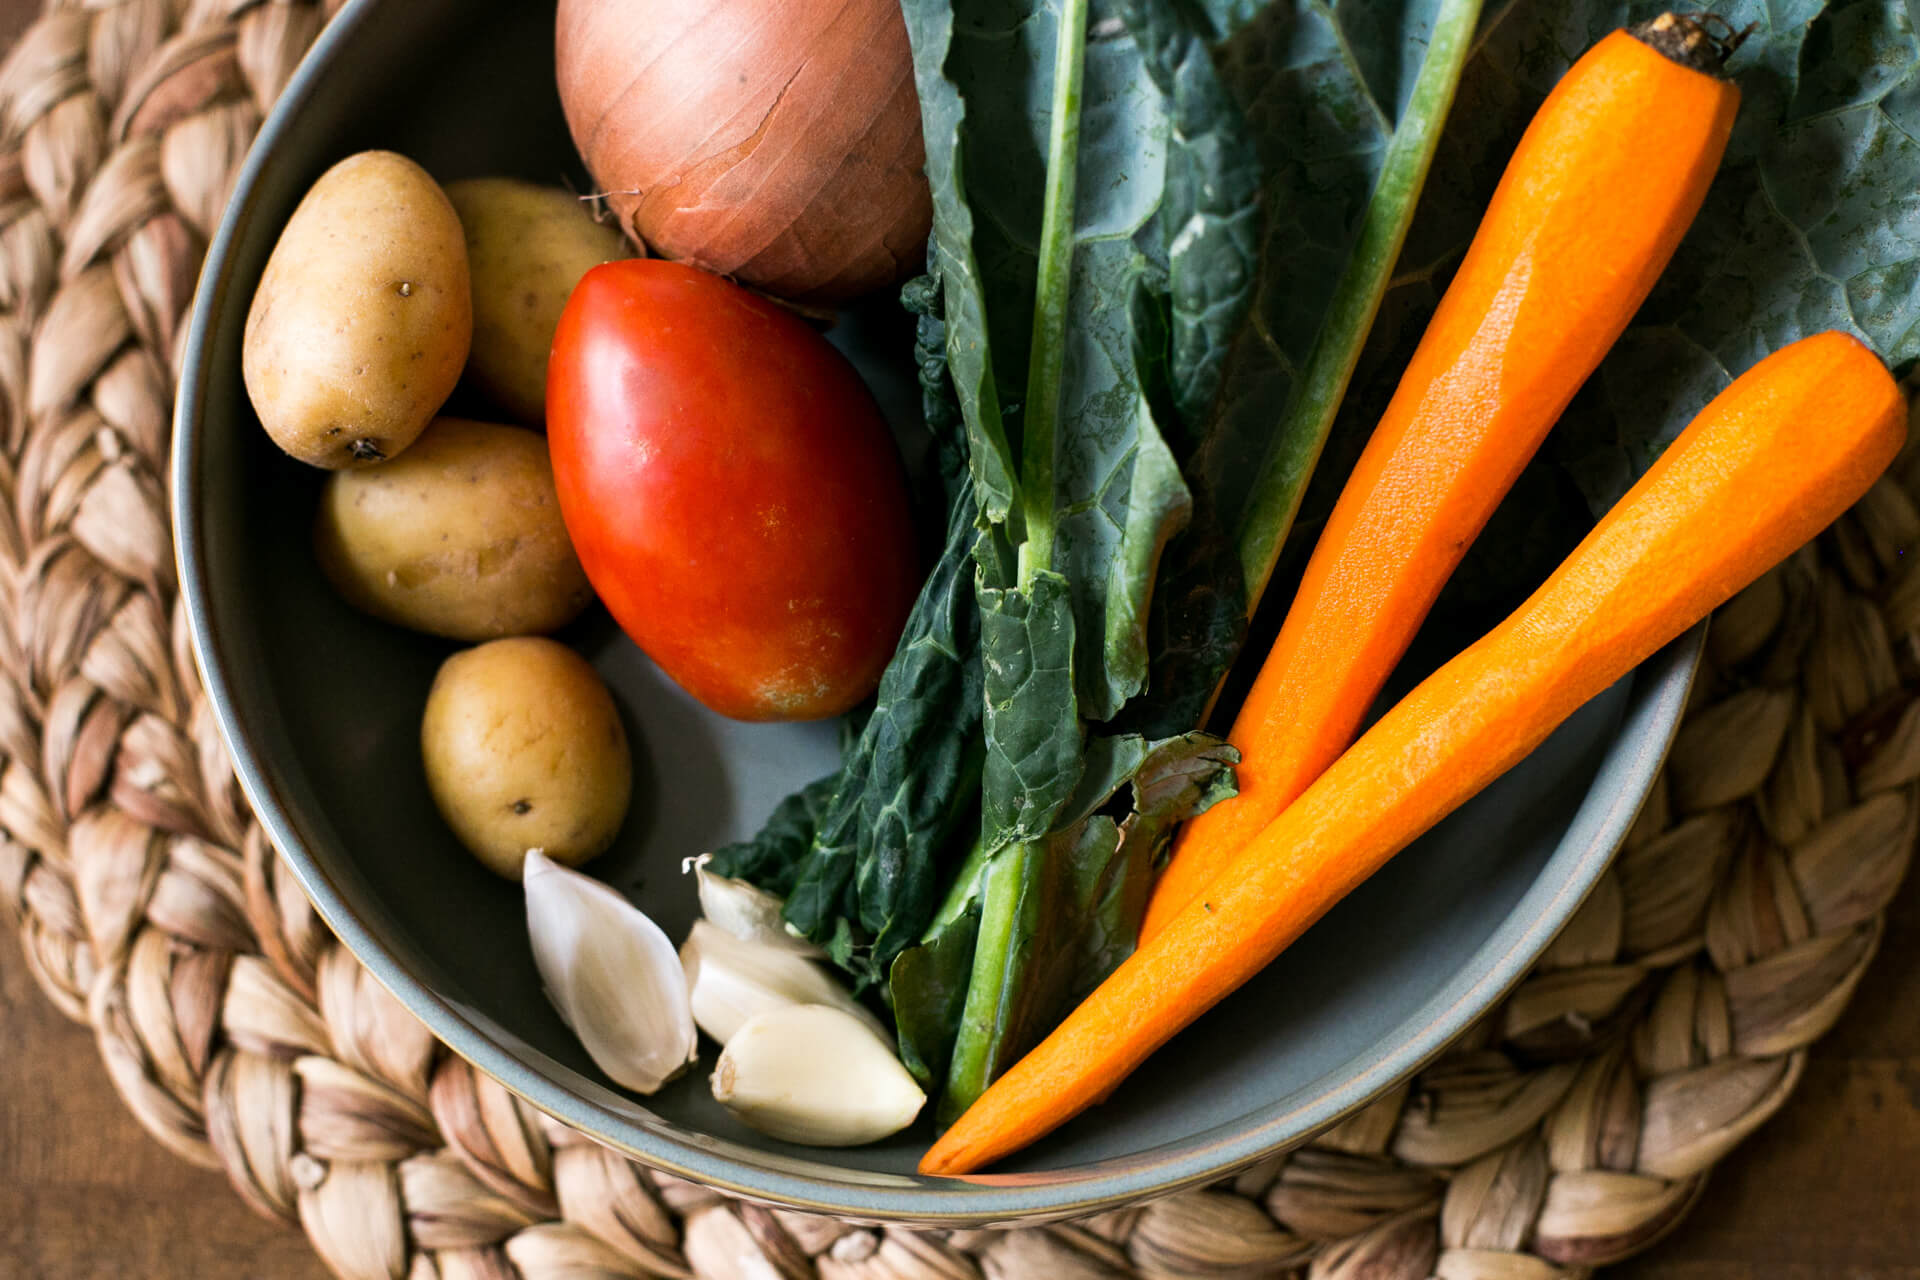 a beautiful assortment of raw veggies